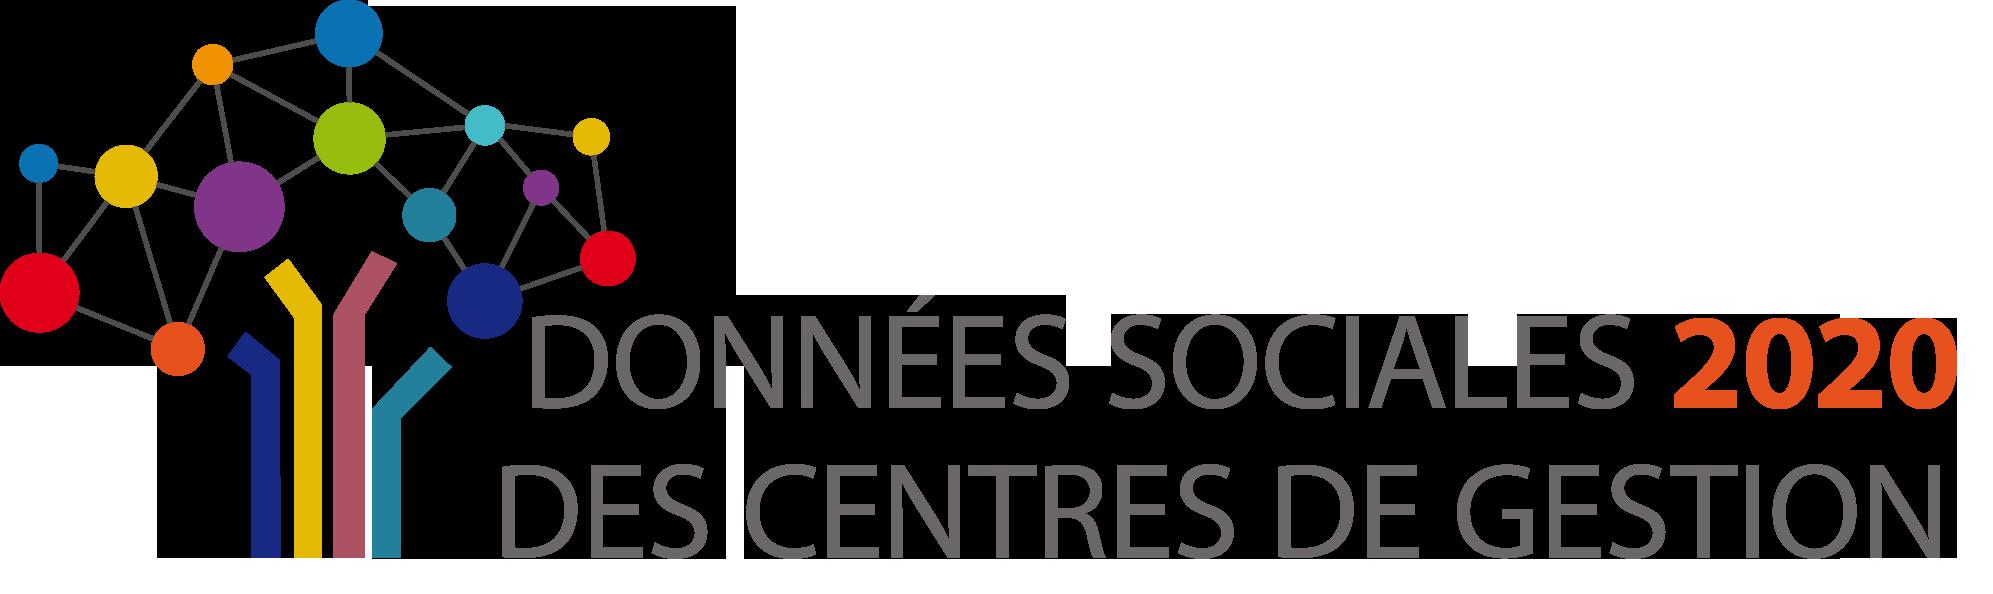 logo-donnees-sociales-2020